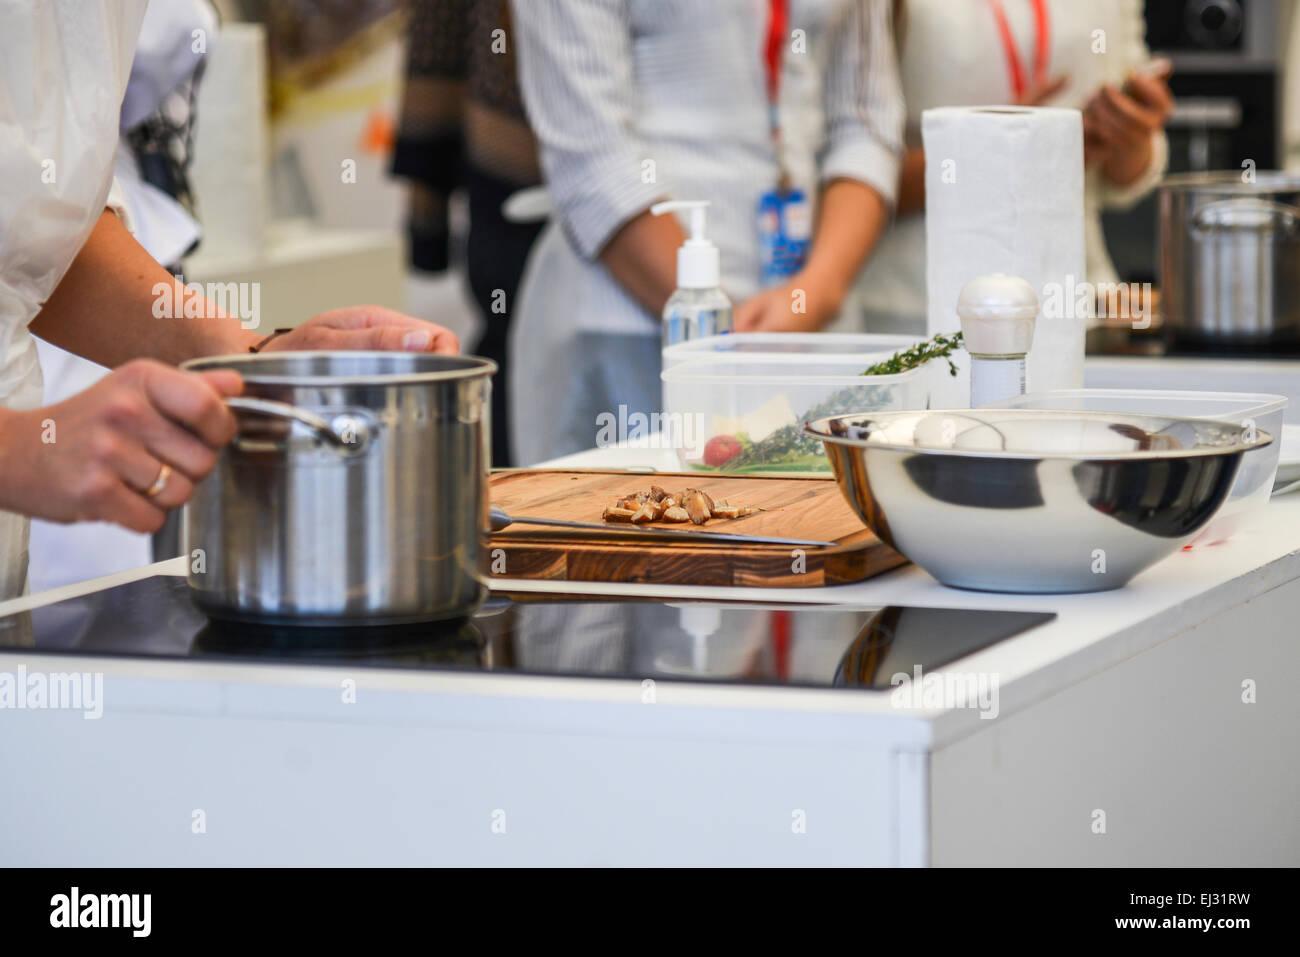 modern kitchen utensils - Stock Image